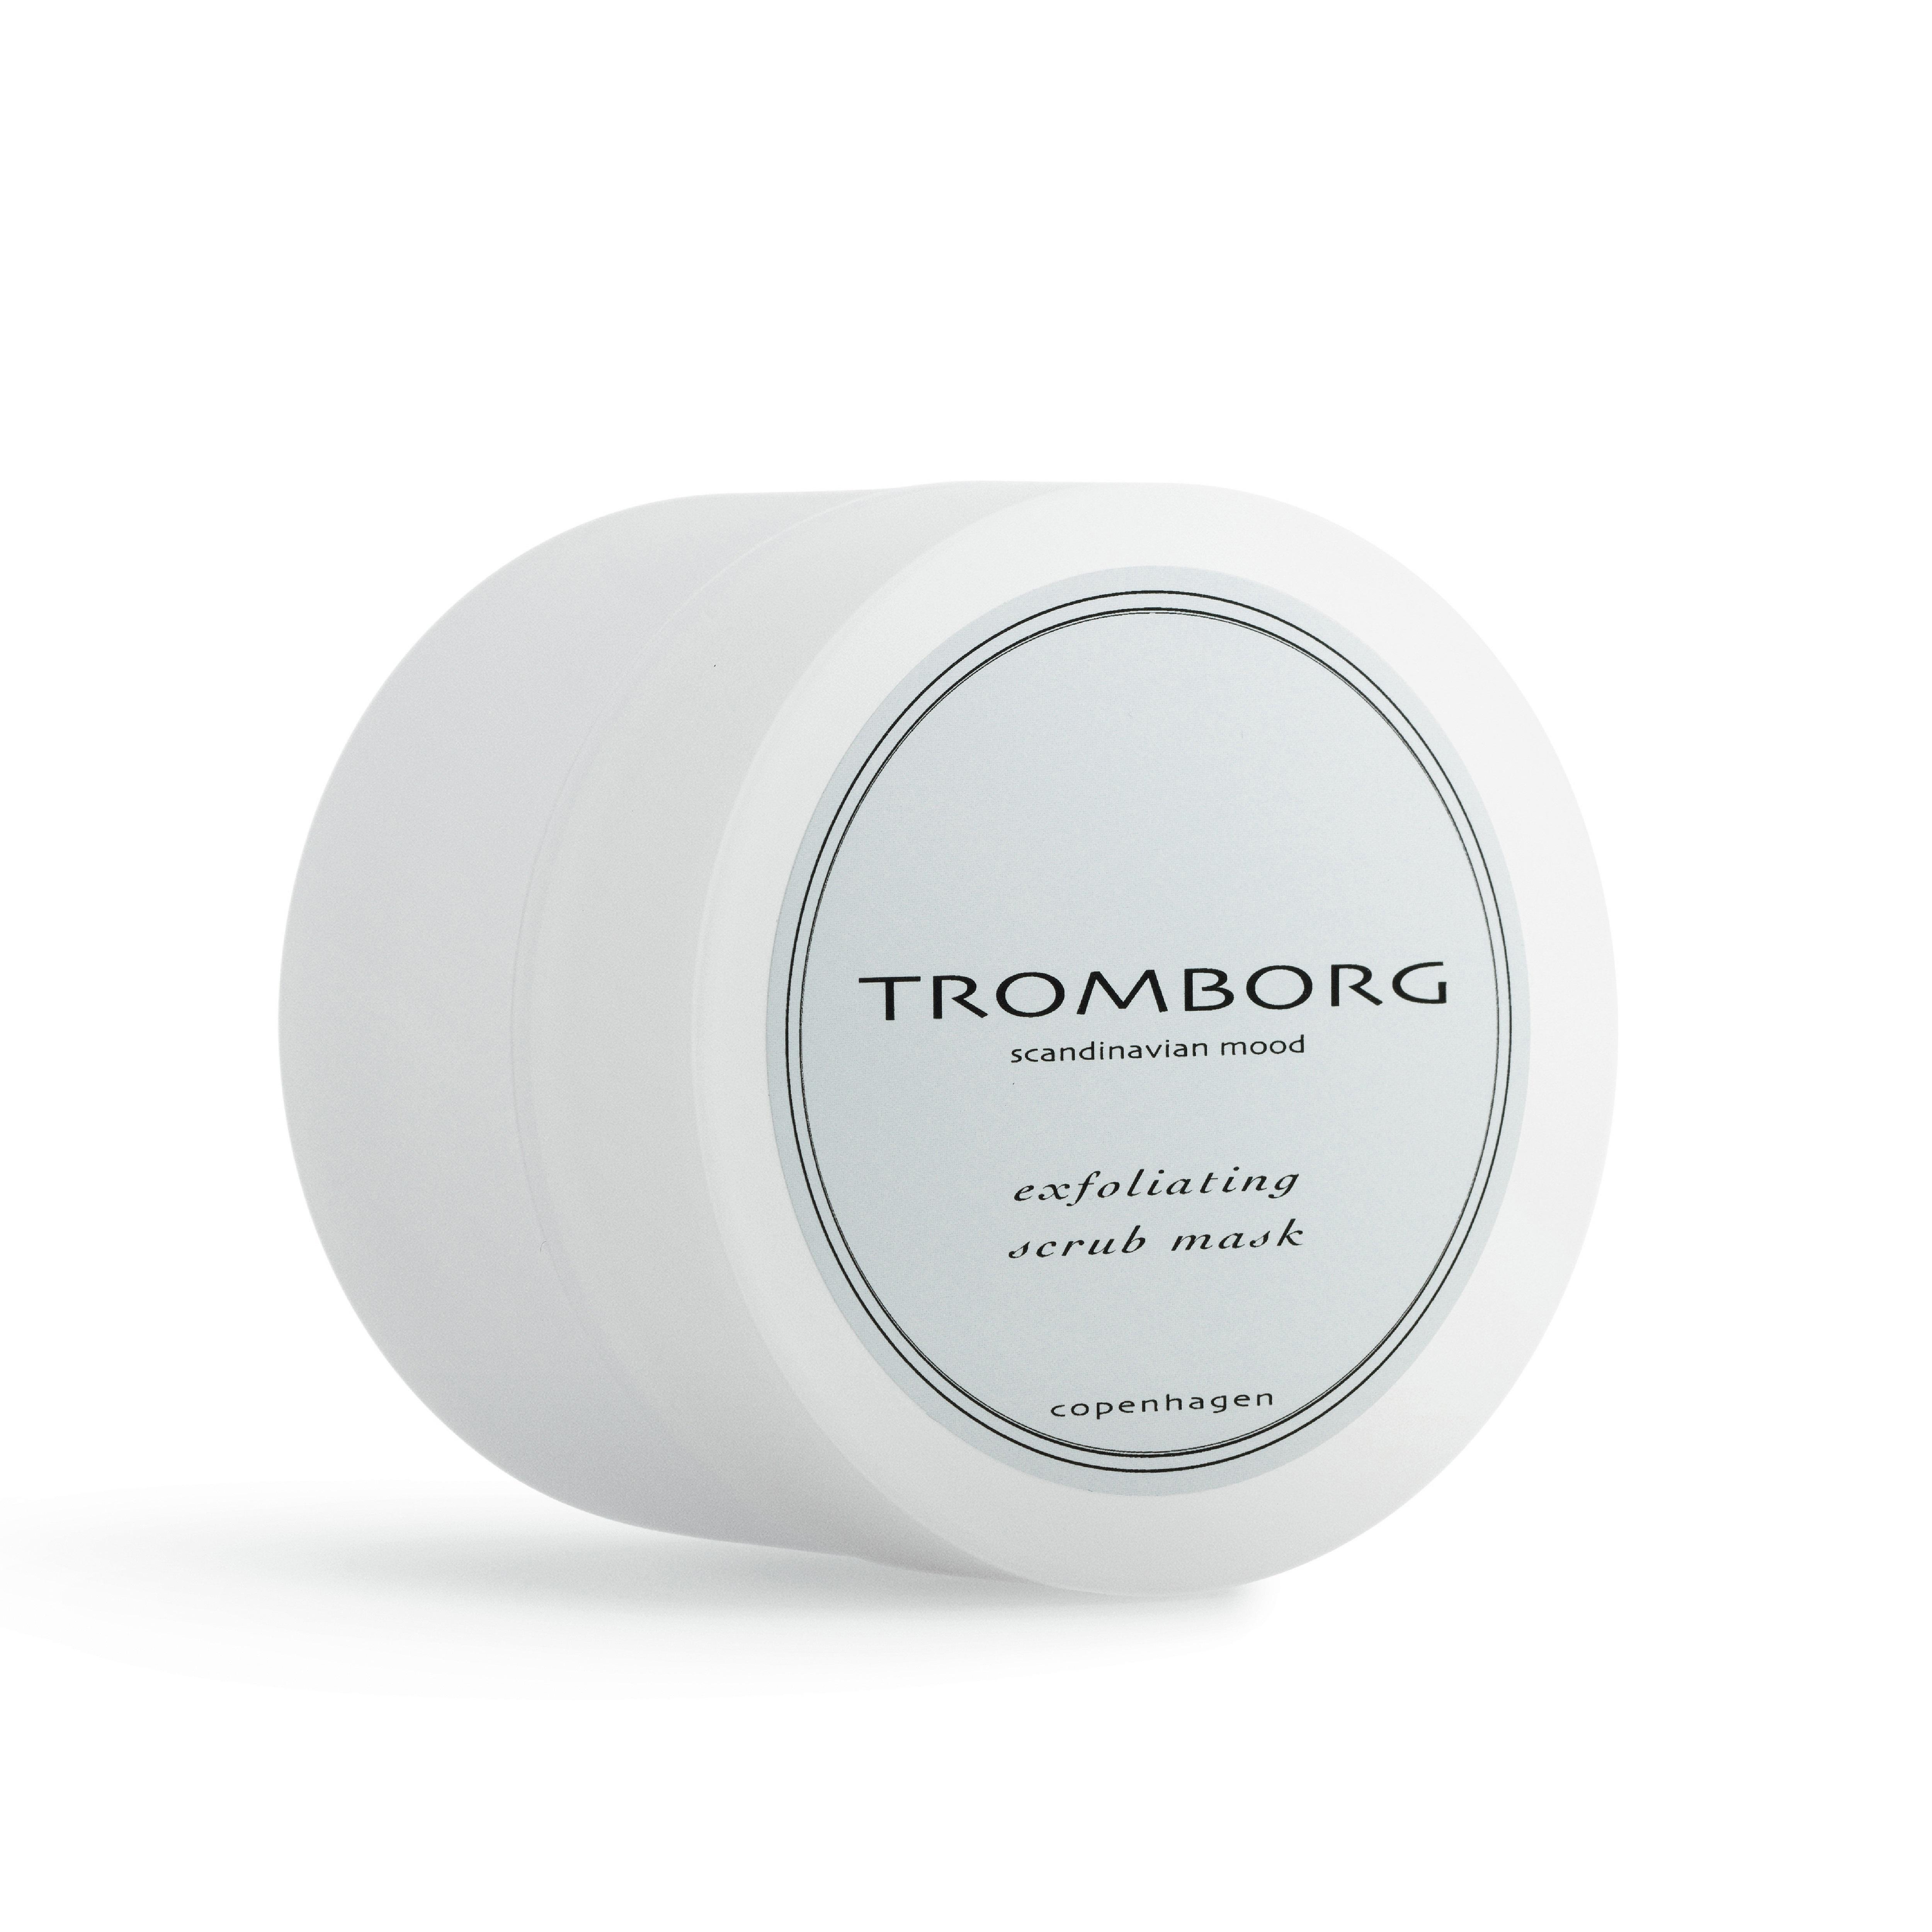 Tromborg Exfoliating Scrub Mask, 50 ml